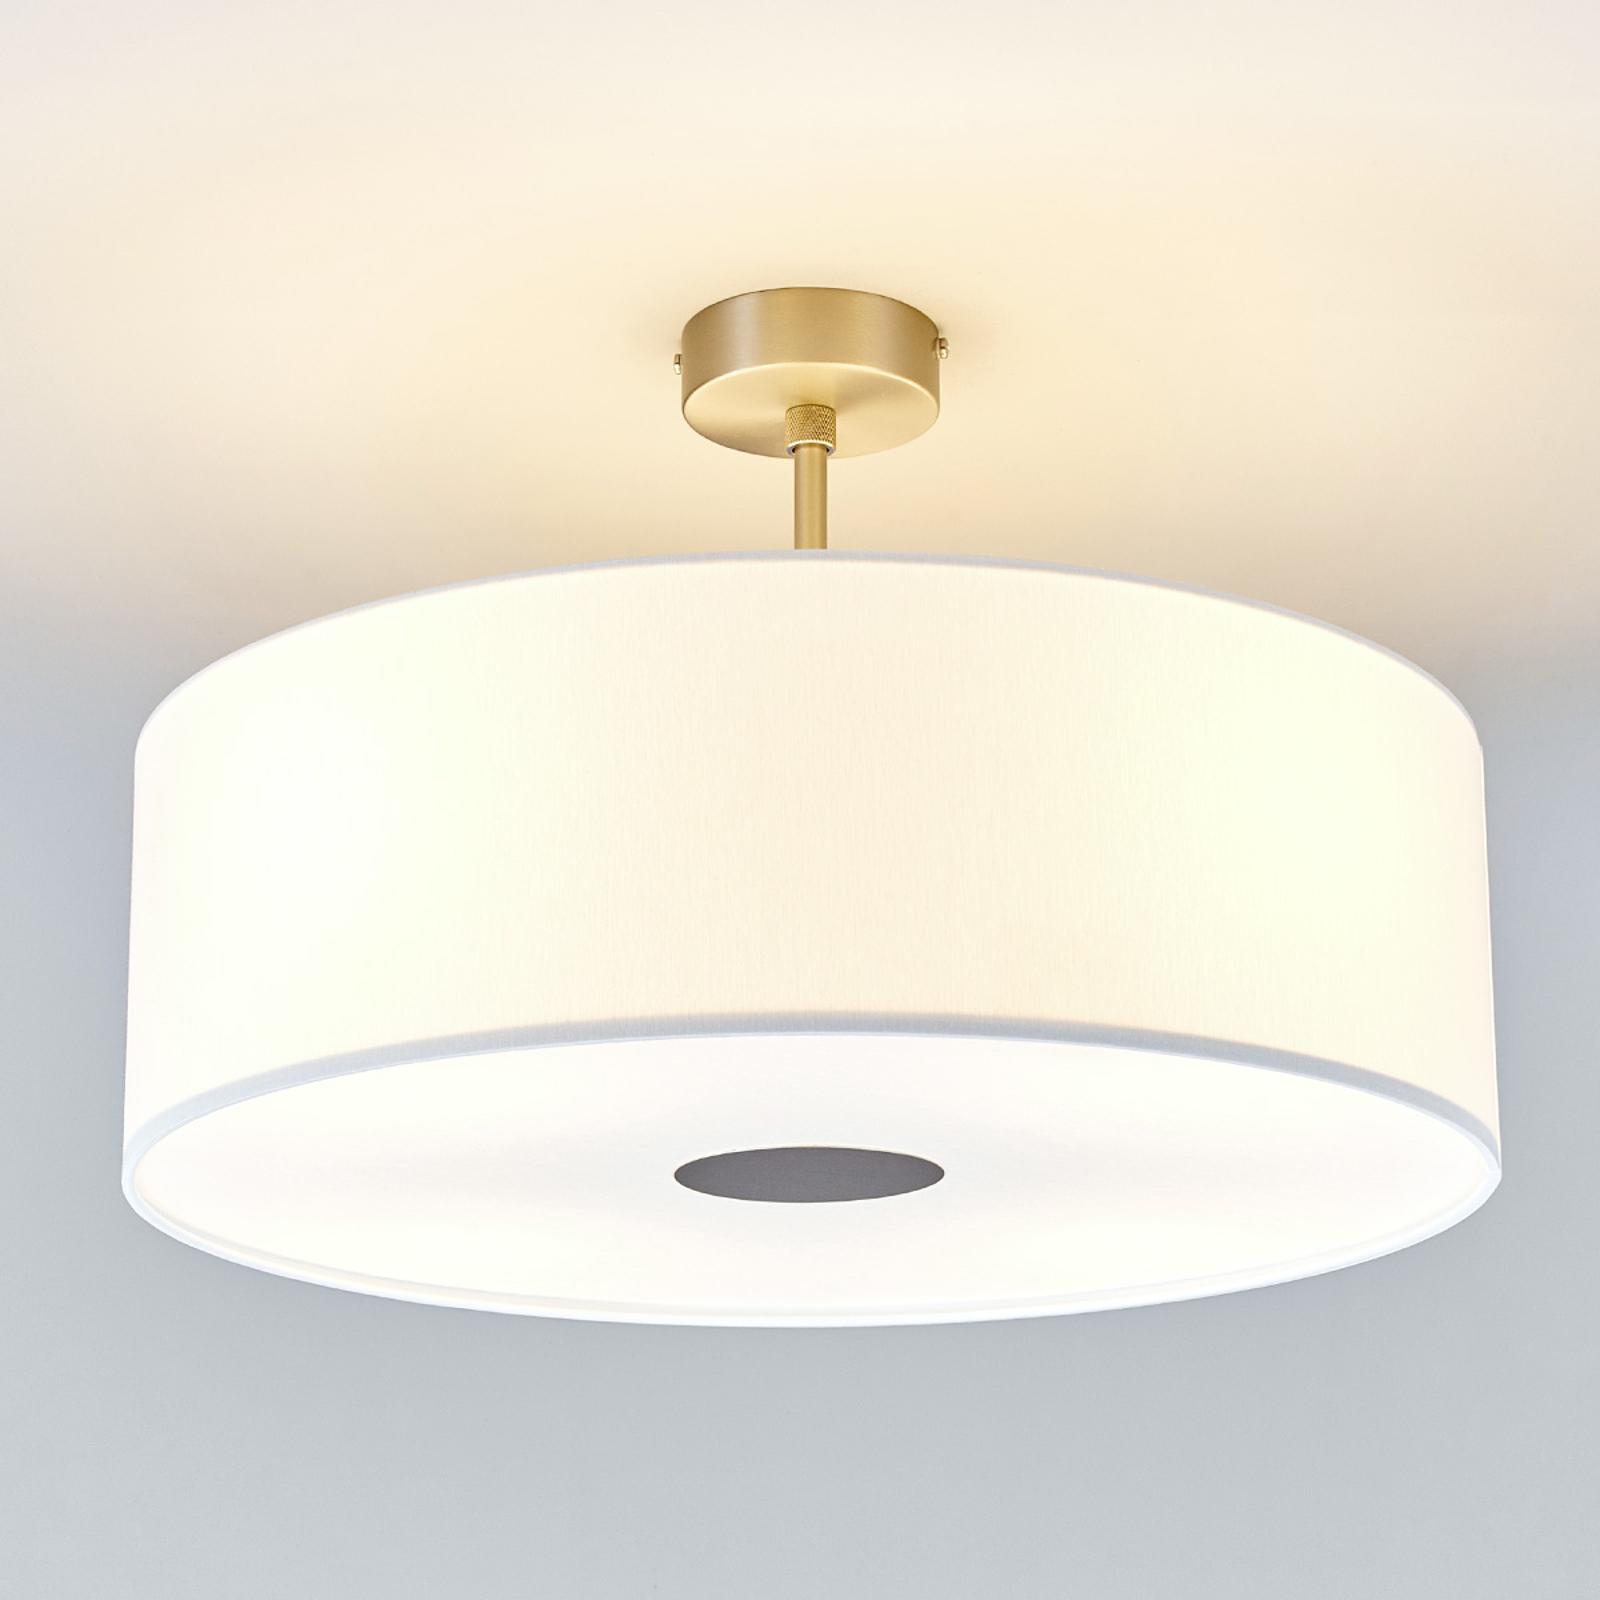 Taklampe med avstand Gala, 50 cm, chintz hvit